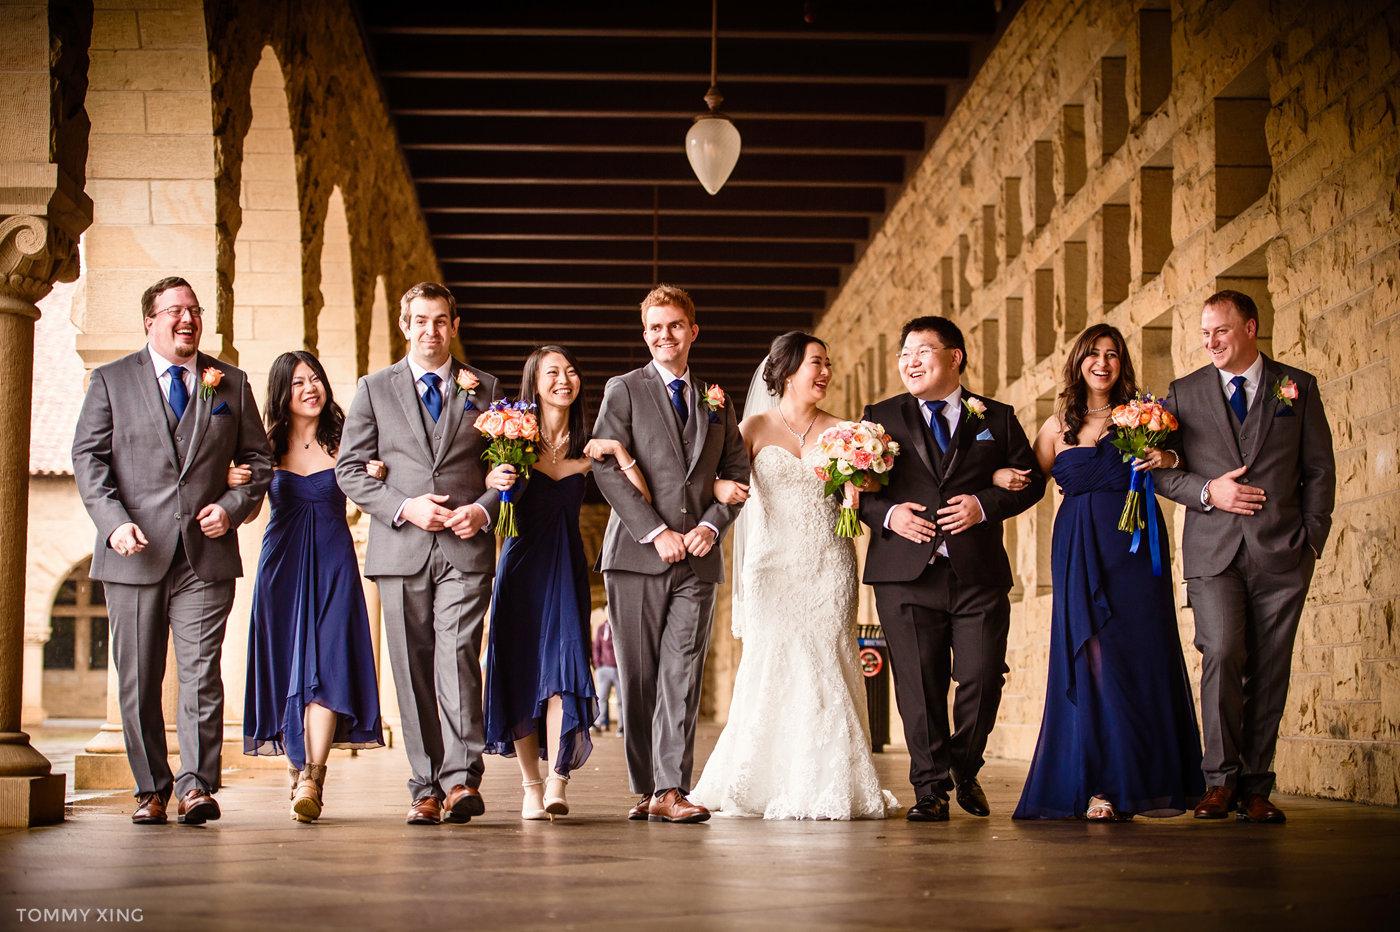 STANFORD MEMORIAL CHURCH WEDDING - Wenjie & Chengcheng - SAN FRANCISCO BAY AREA 斯坦福教堂婚礼跟拍 - 洛杉矶婚礼婚纱照摄影师 Tommy Xing Photography150.jpg